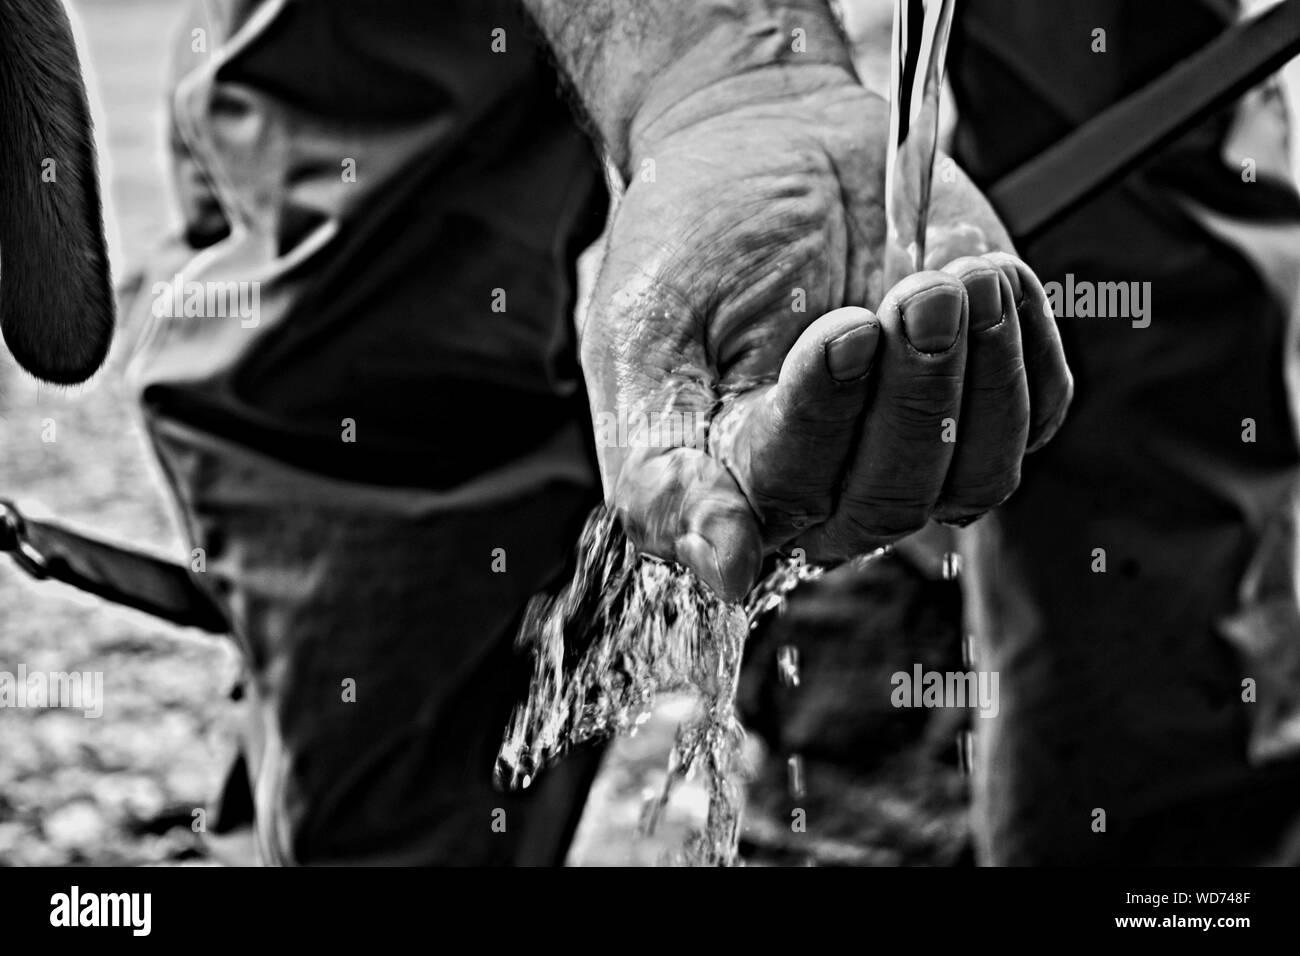 La main de l'eau capture/ mains attraper la chute de l'eau propre Banque D'Images